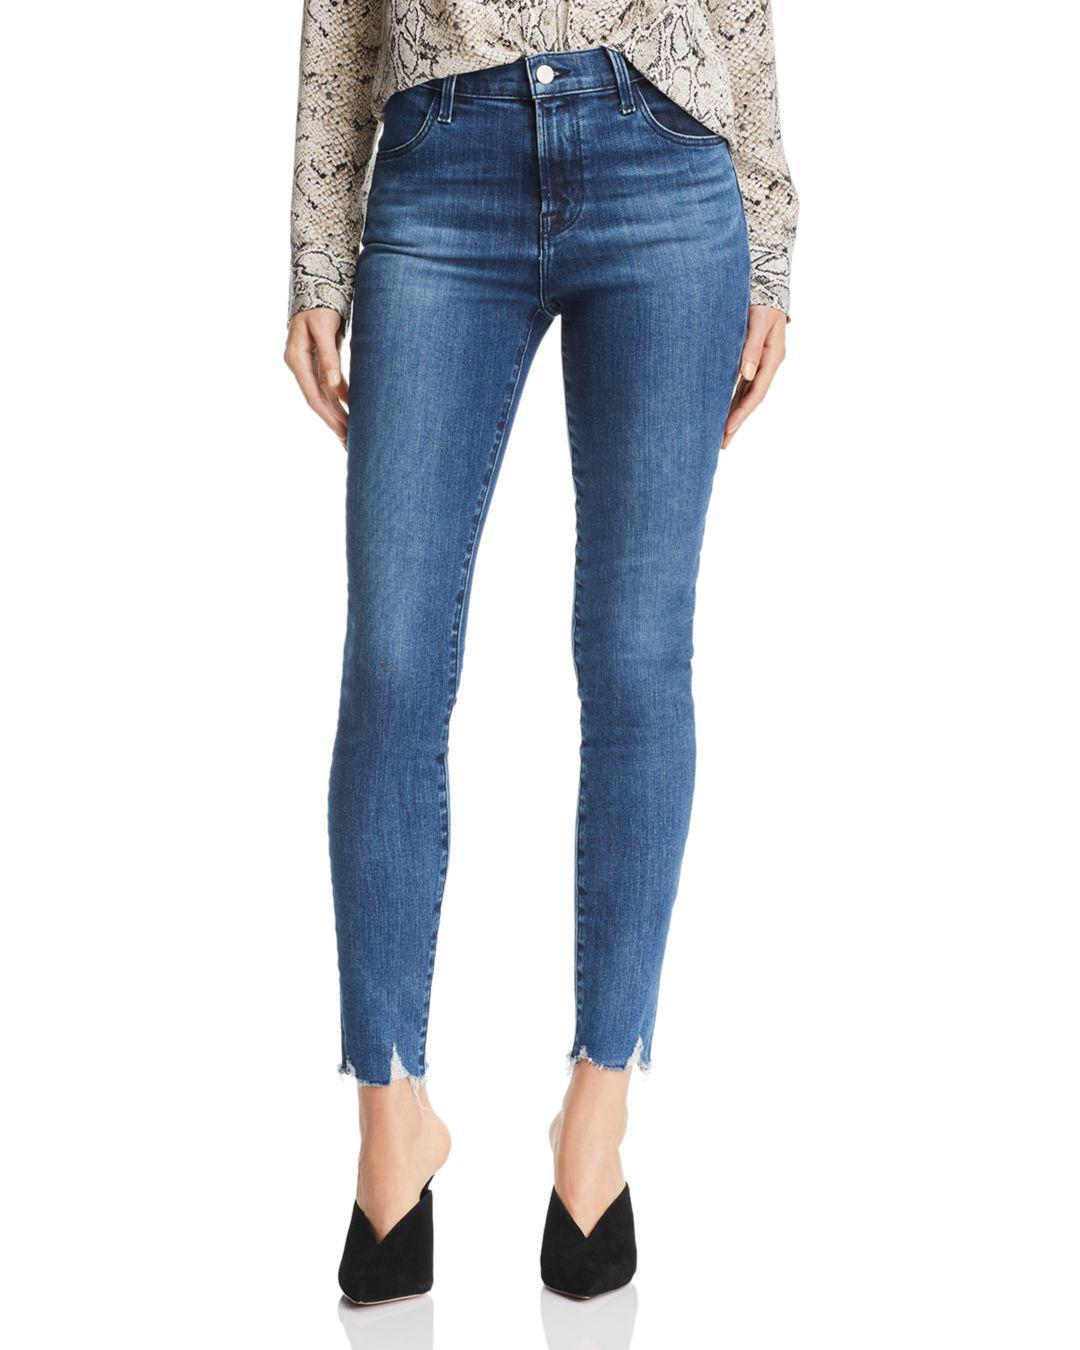 3eafe8334df7e Lyst - J Brand Maria High Rise Skinny Jeans In Rising Destruct in Blue